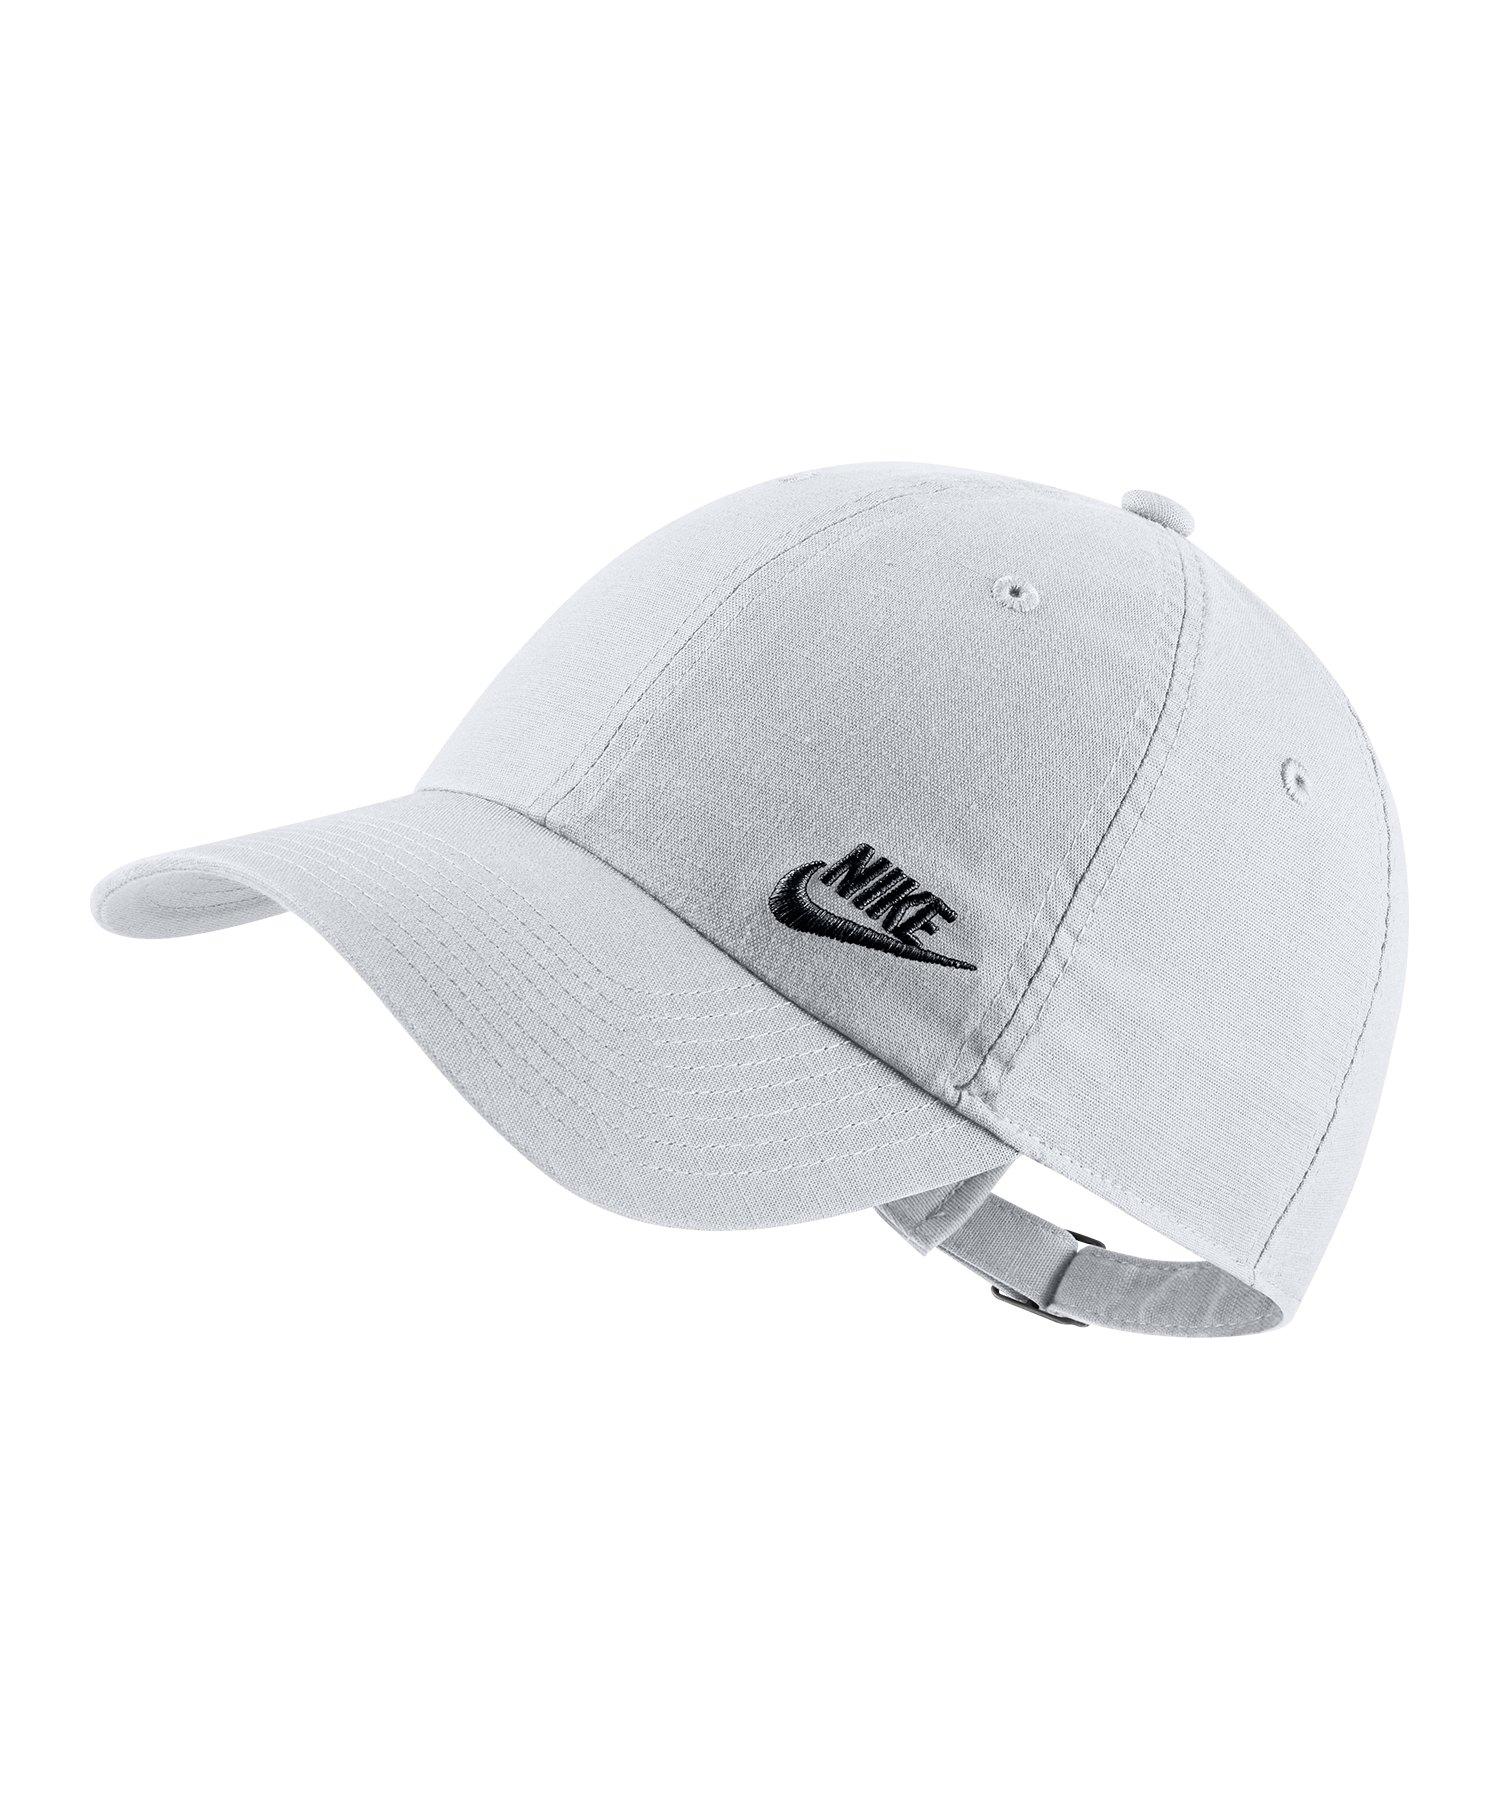 Nike Heritage 86 Classic Kappe Damen Weiss F101 - weiss